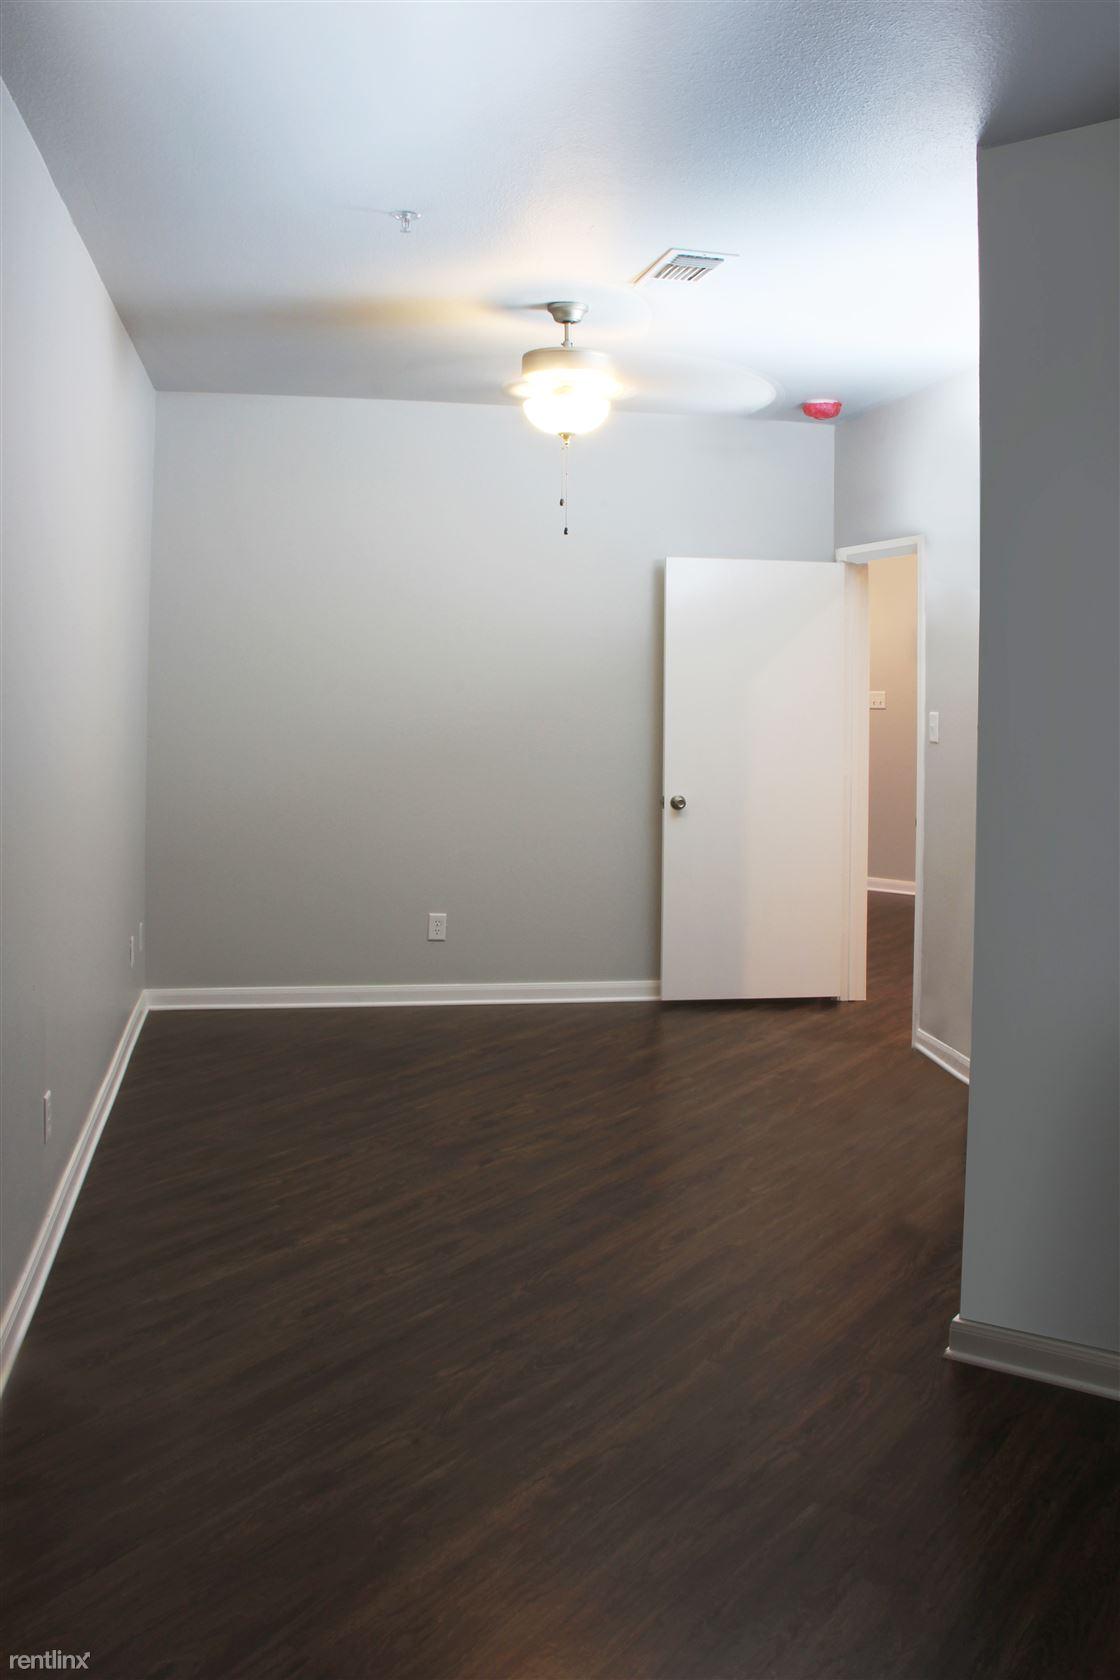 A2-BedroomFlat